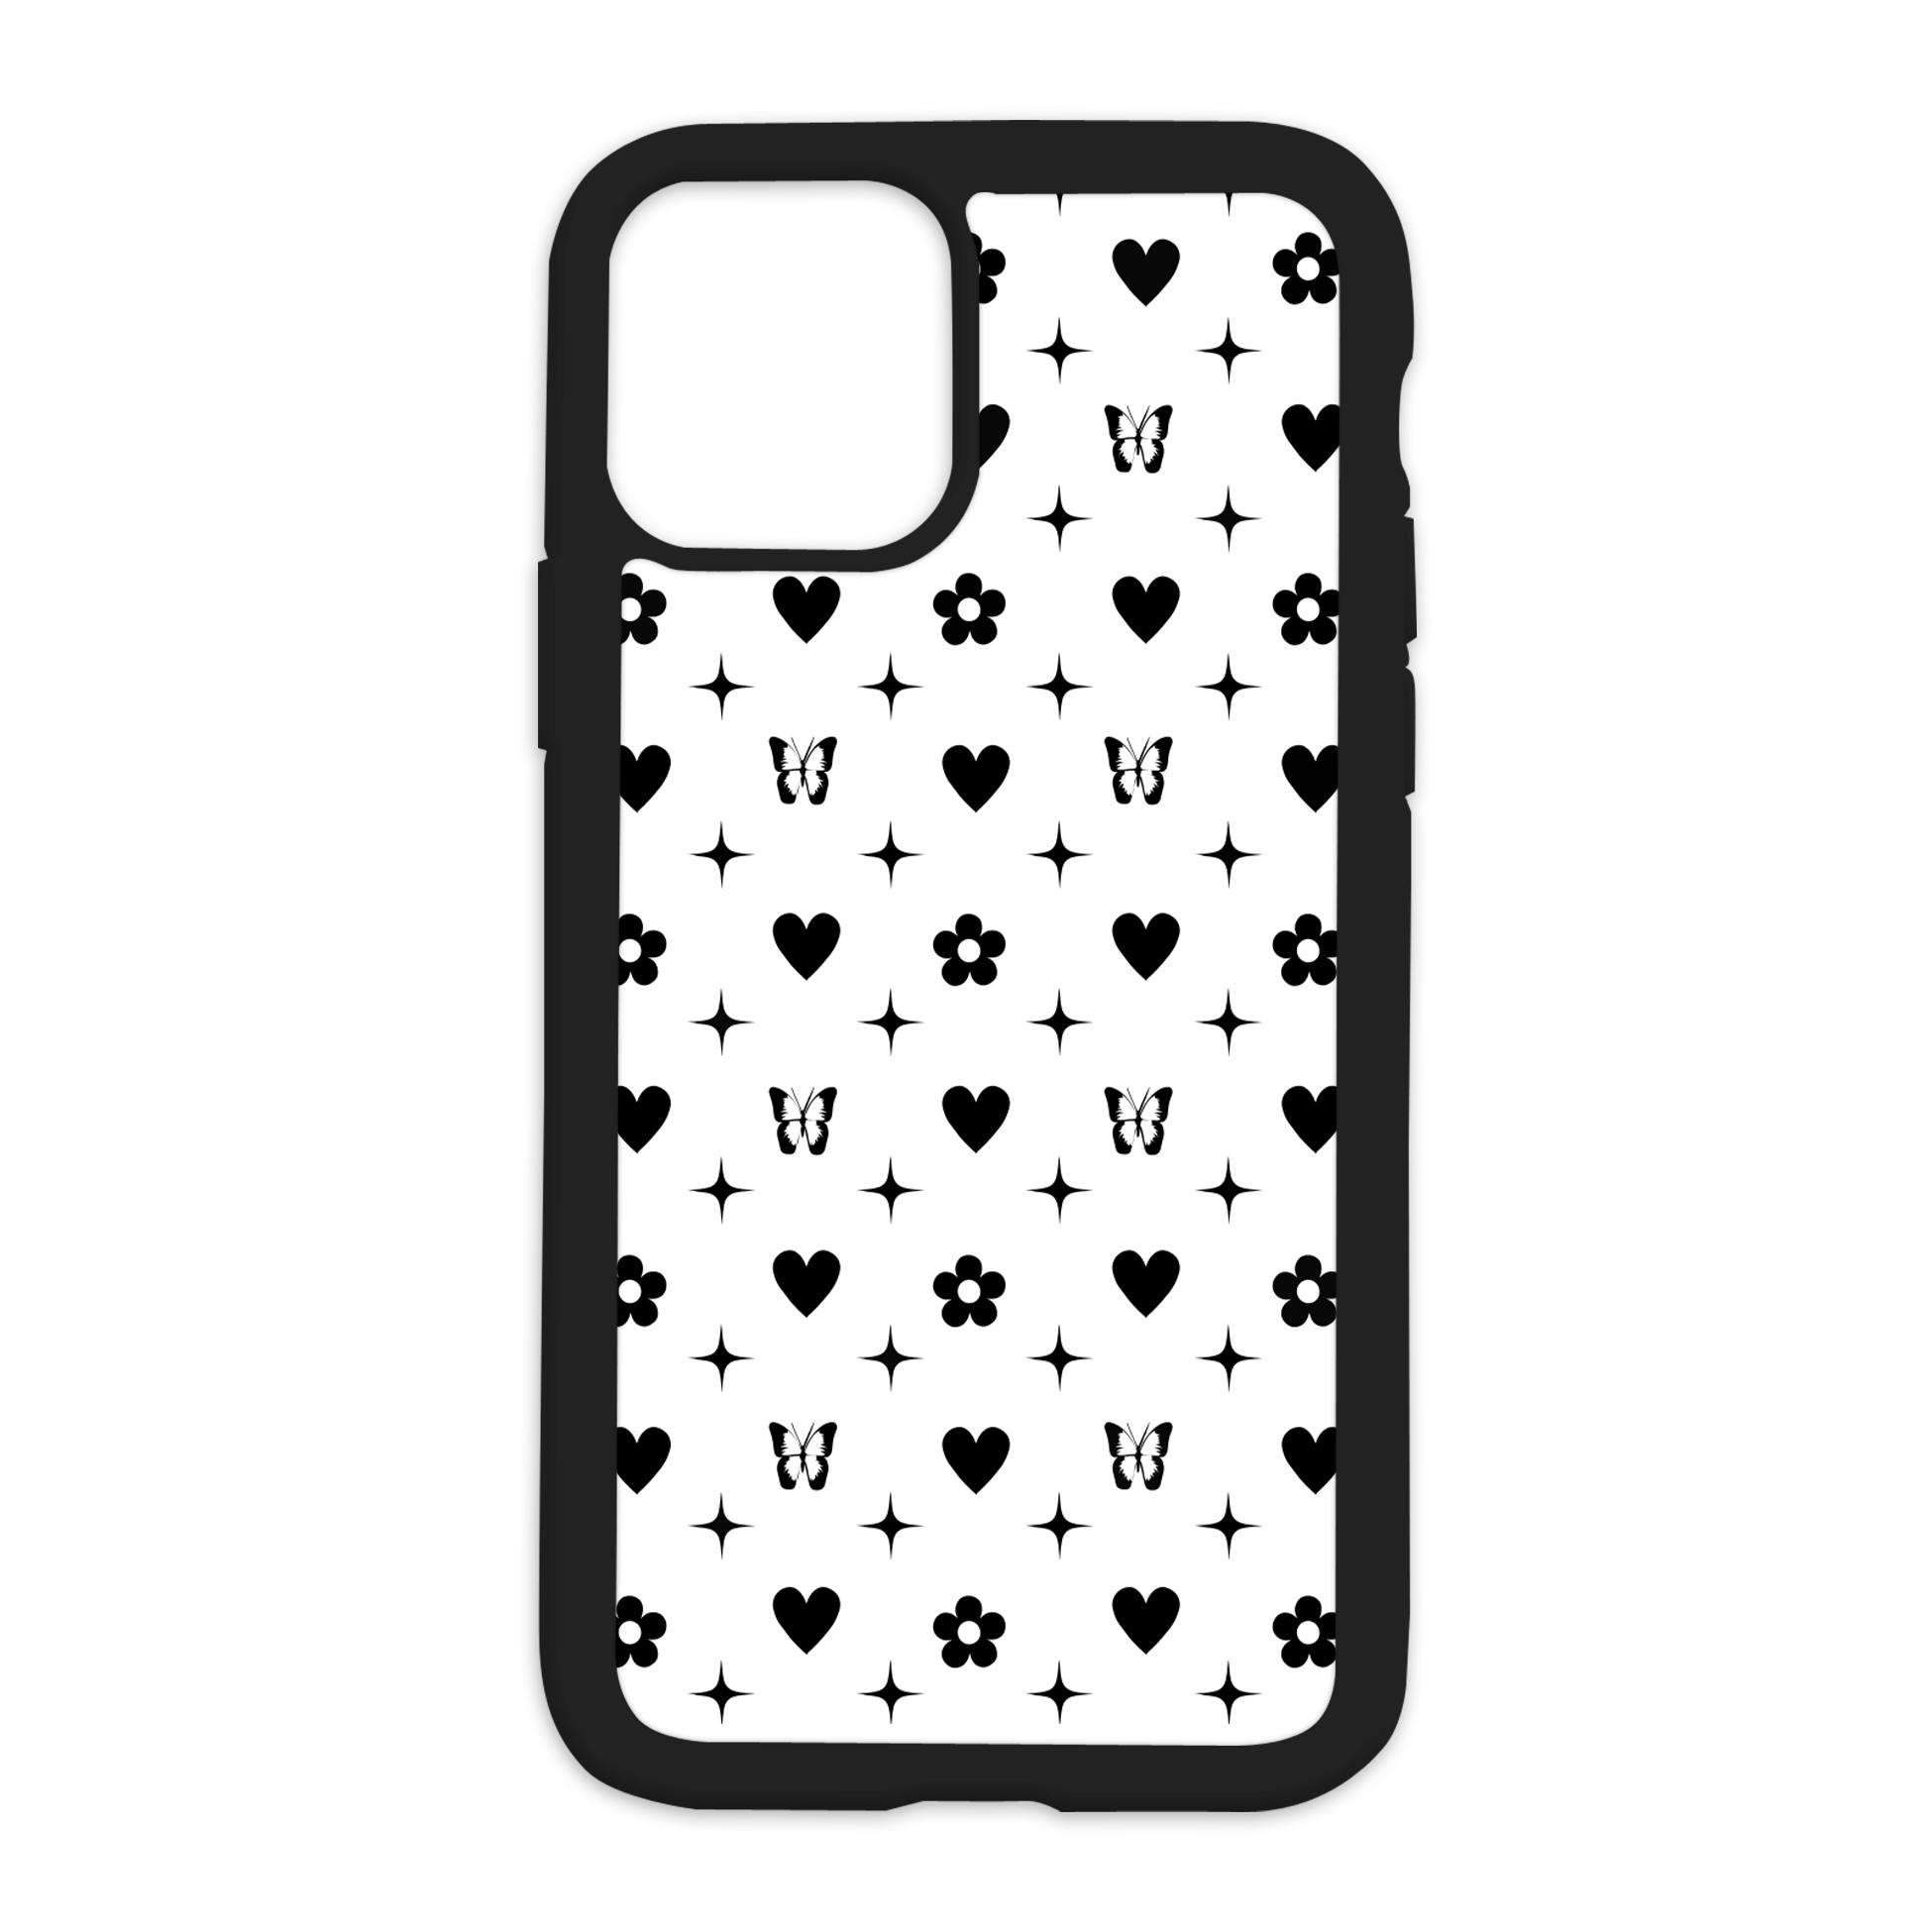 Colored Vibez Design On Black Phone Case - 6/6s / Black